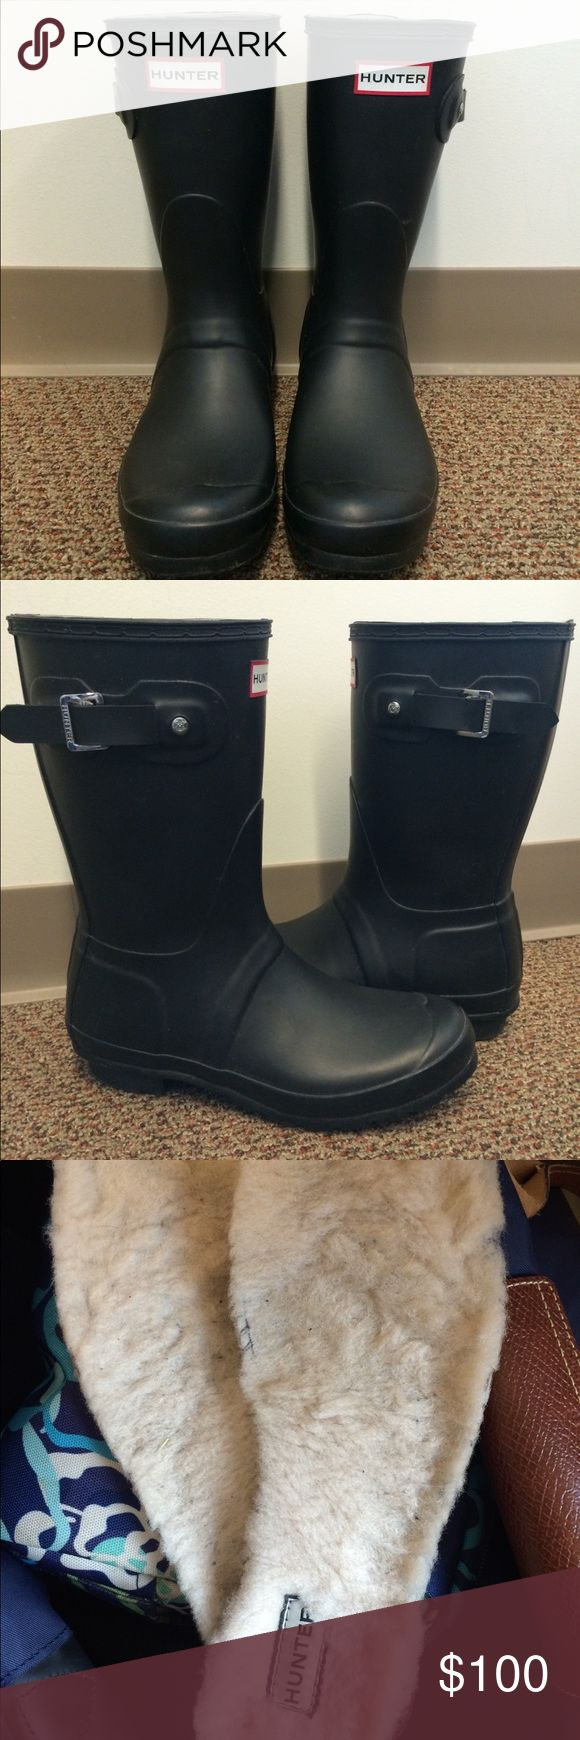 Women's Hunter Original Short Rain Boots Lightly worn women's Hunter Original Short Rain Boots in matte black! Also comes with Hunter shearling insoles. Hunter Boots Shoes Winter & Rain Boots